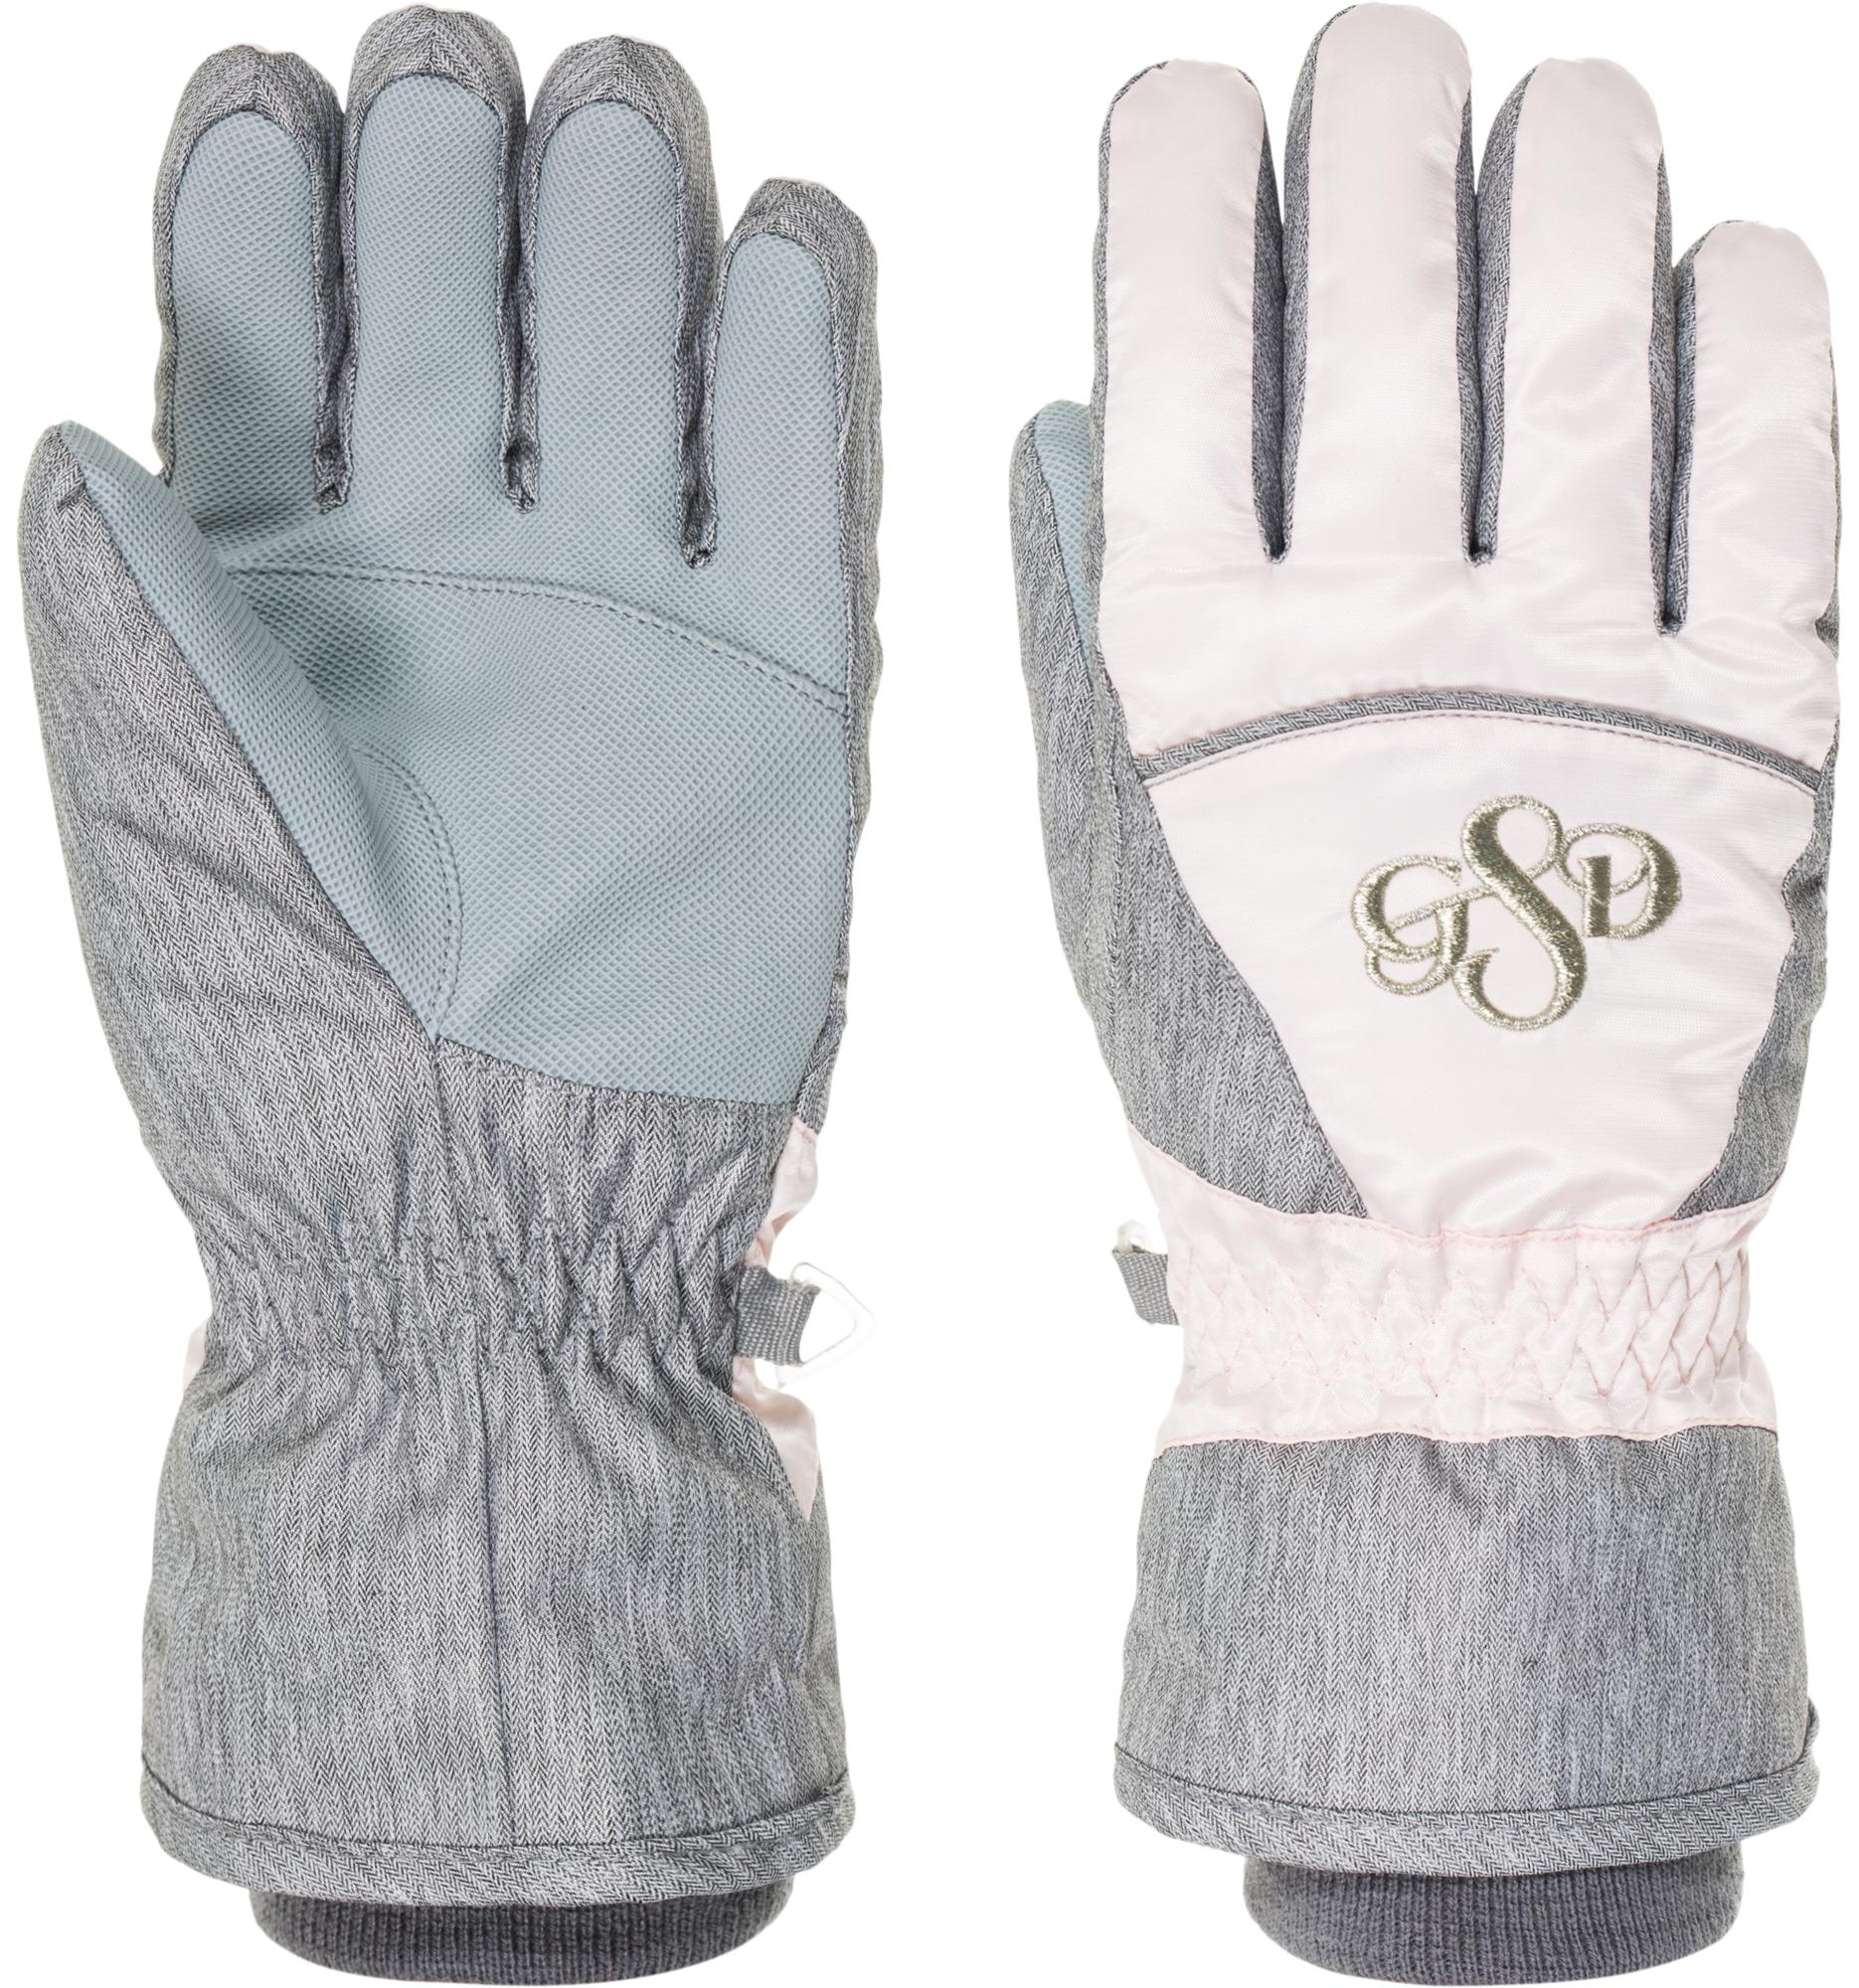 Glissade Перчатки для девочек Glissade, размер 5